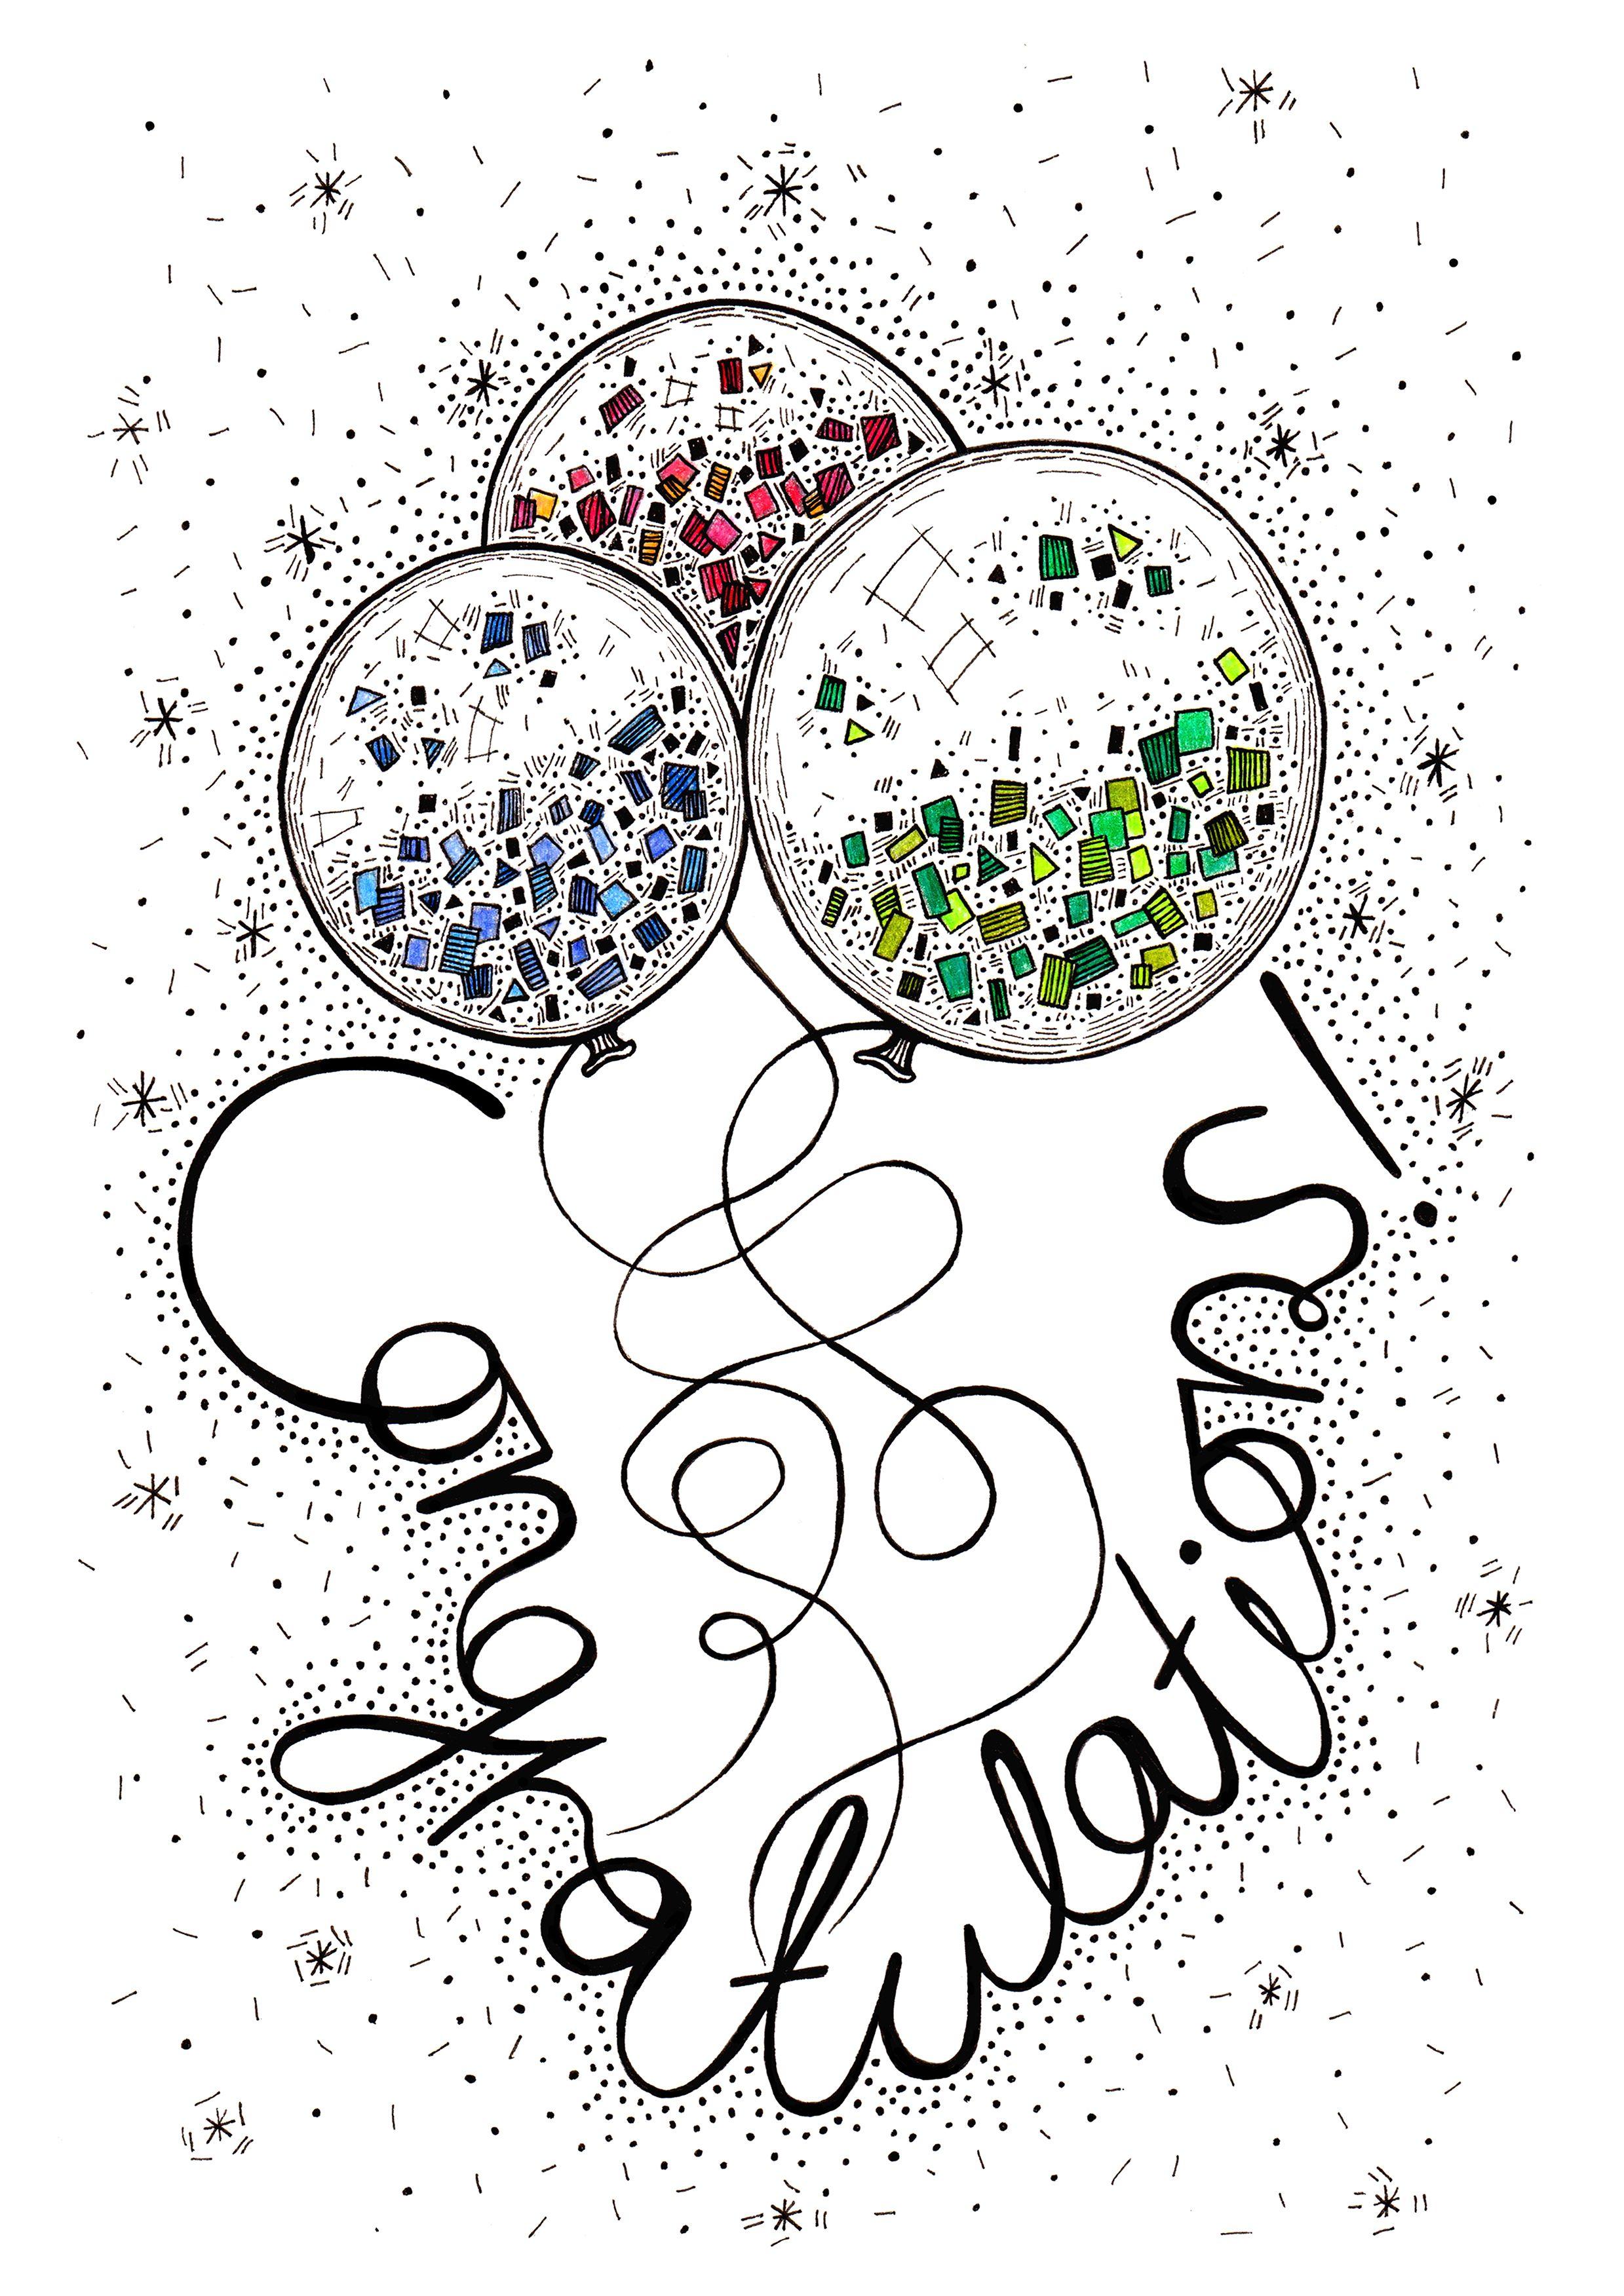 Congratulations Card Design By Laura Dumbrell My Doodles